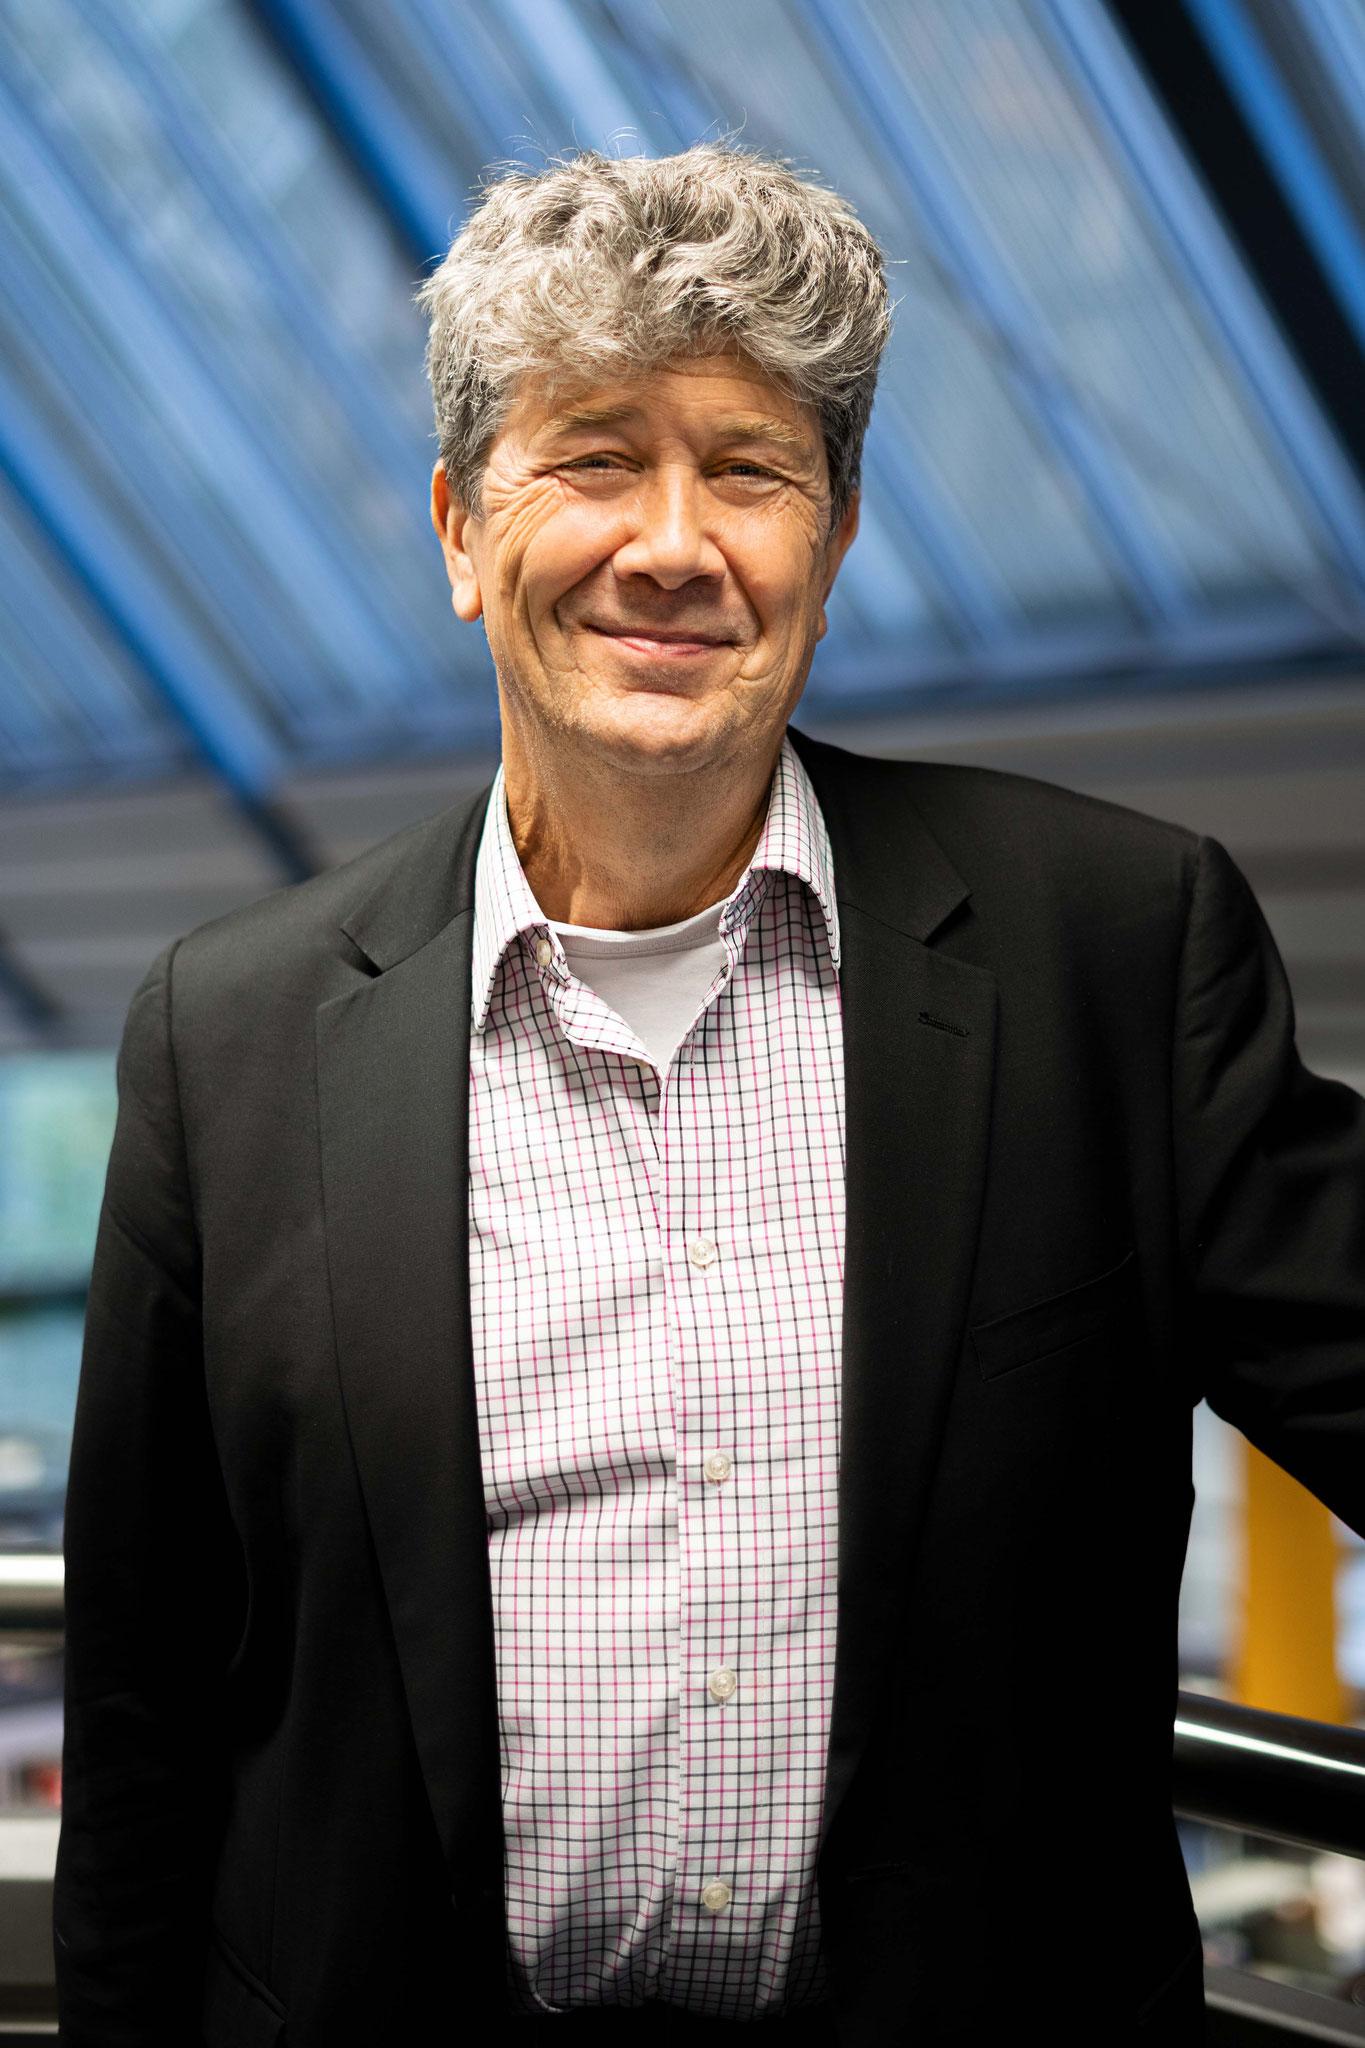 Prof. Dr. Christian Jansen